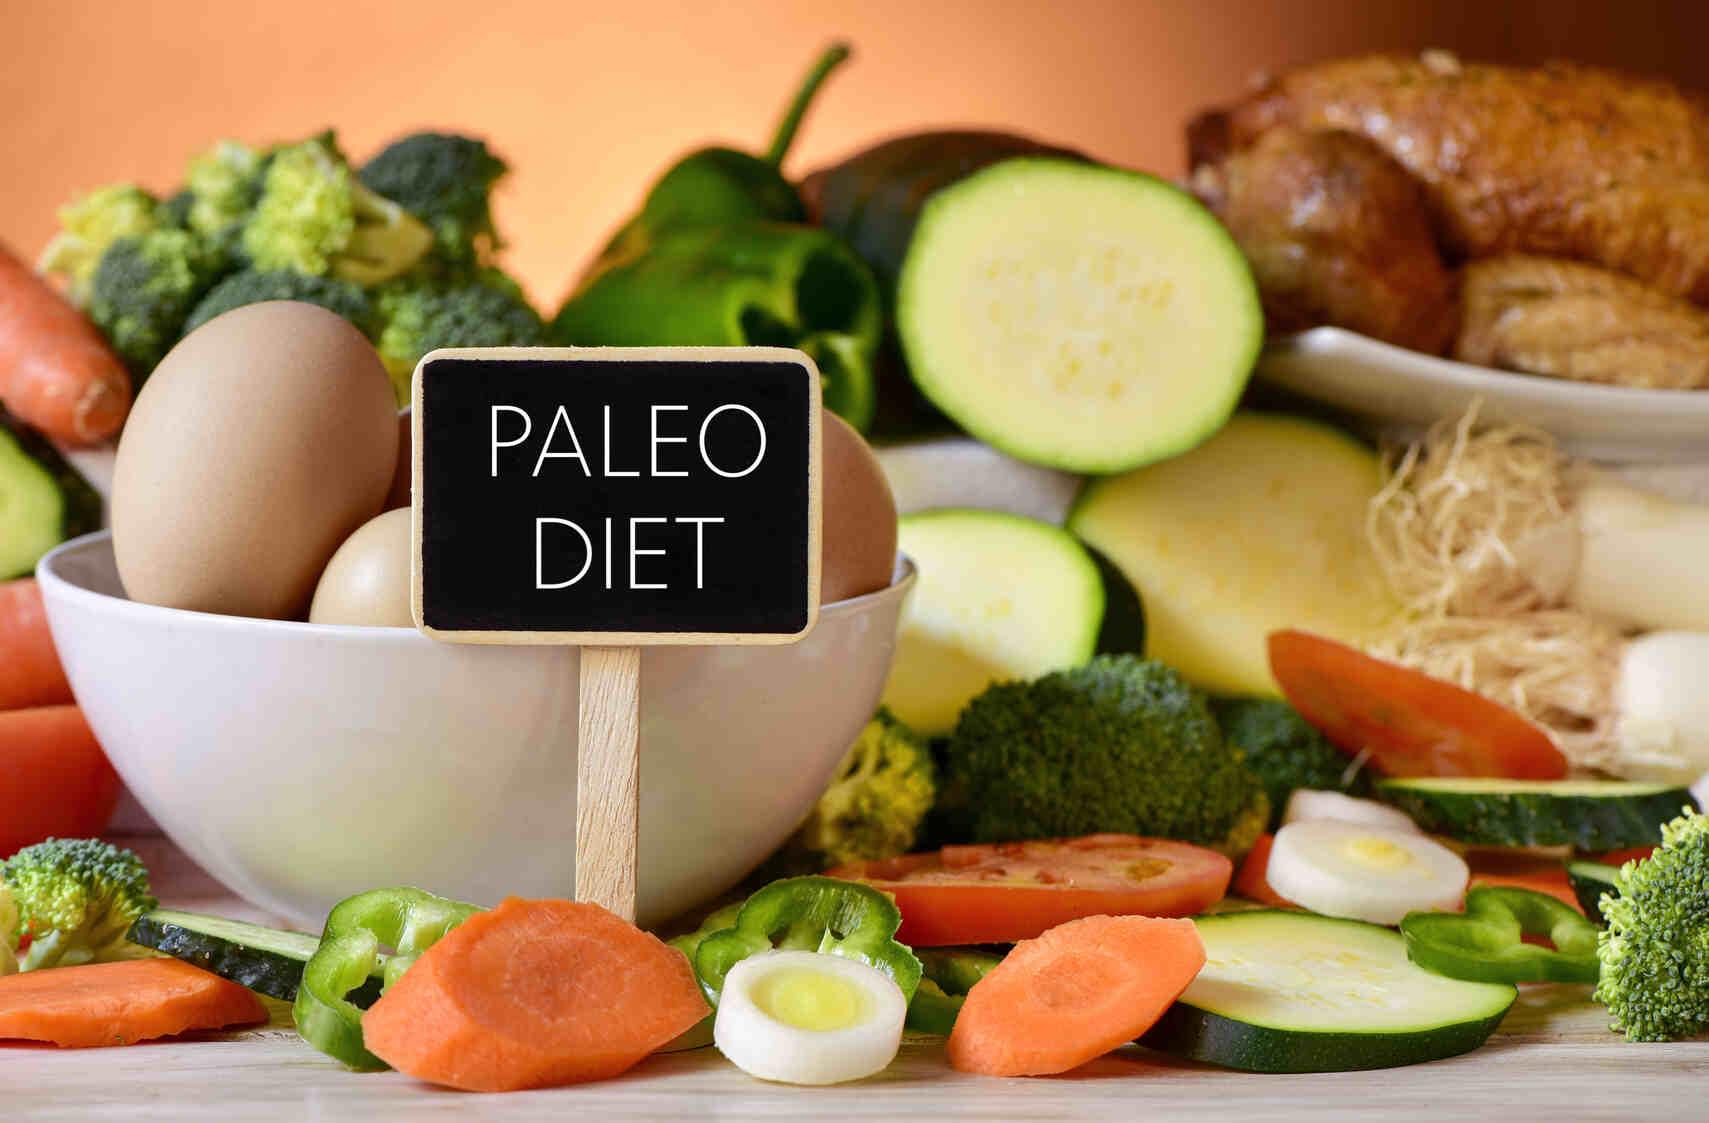 Paleo Diet – Meal Plan, Food List & Benefits